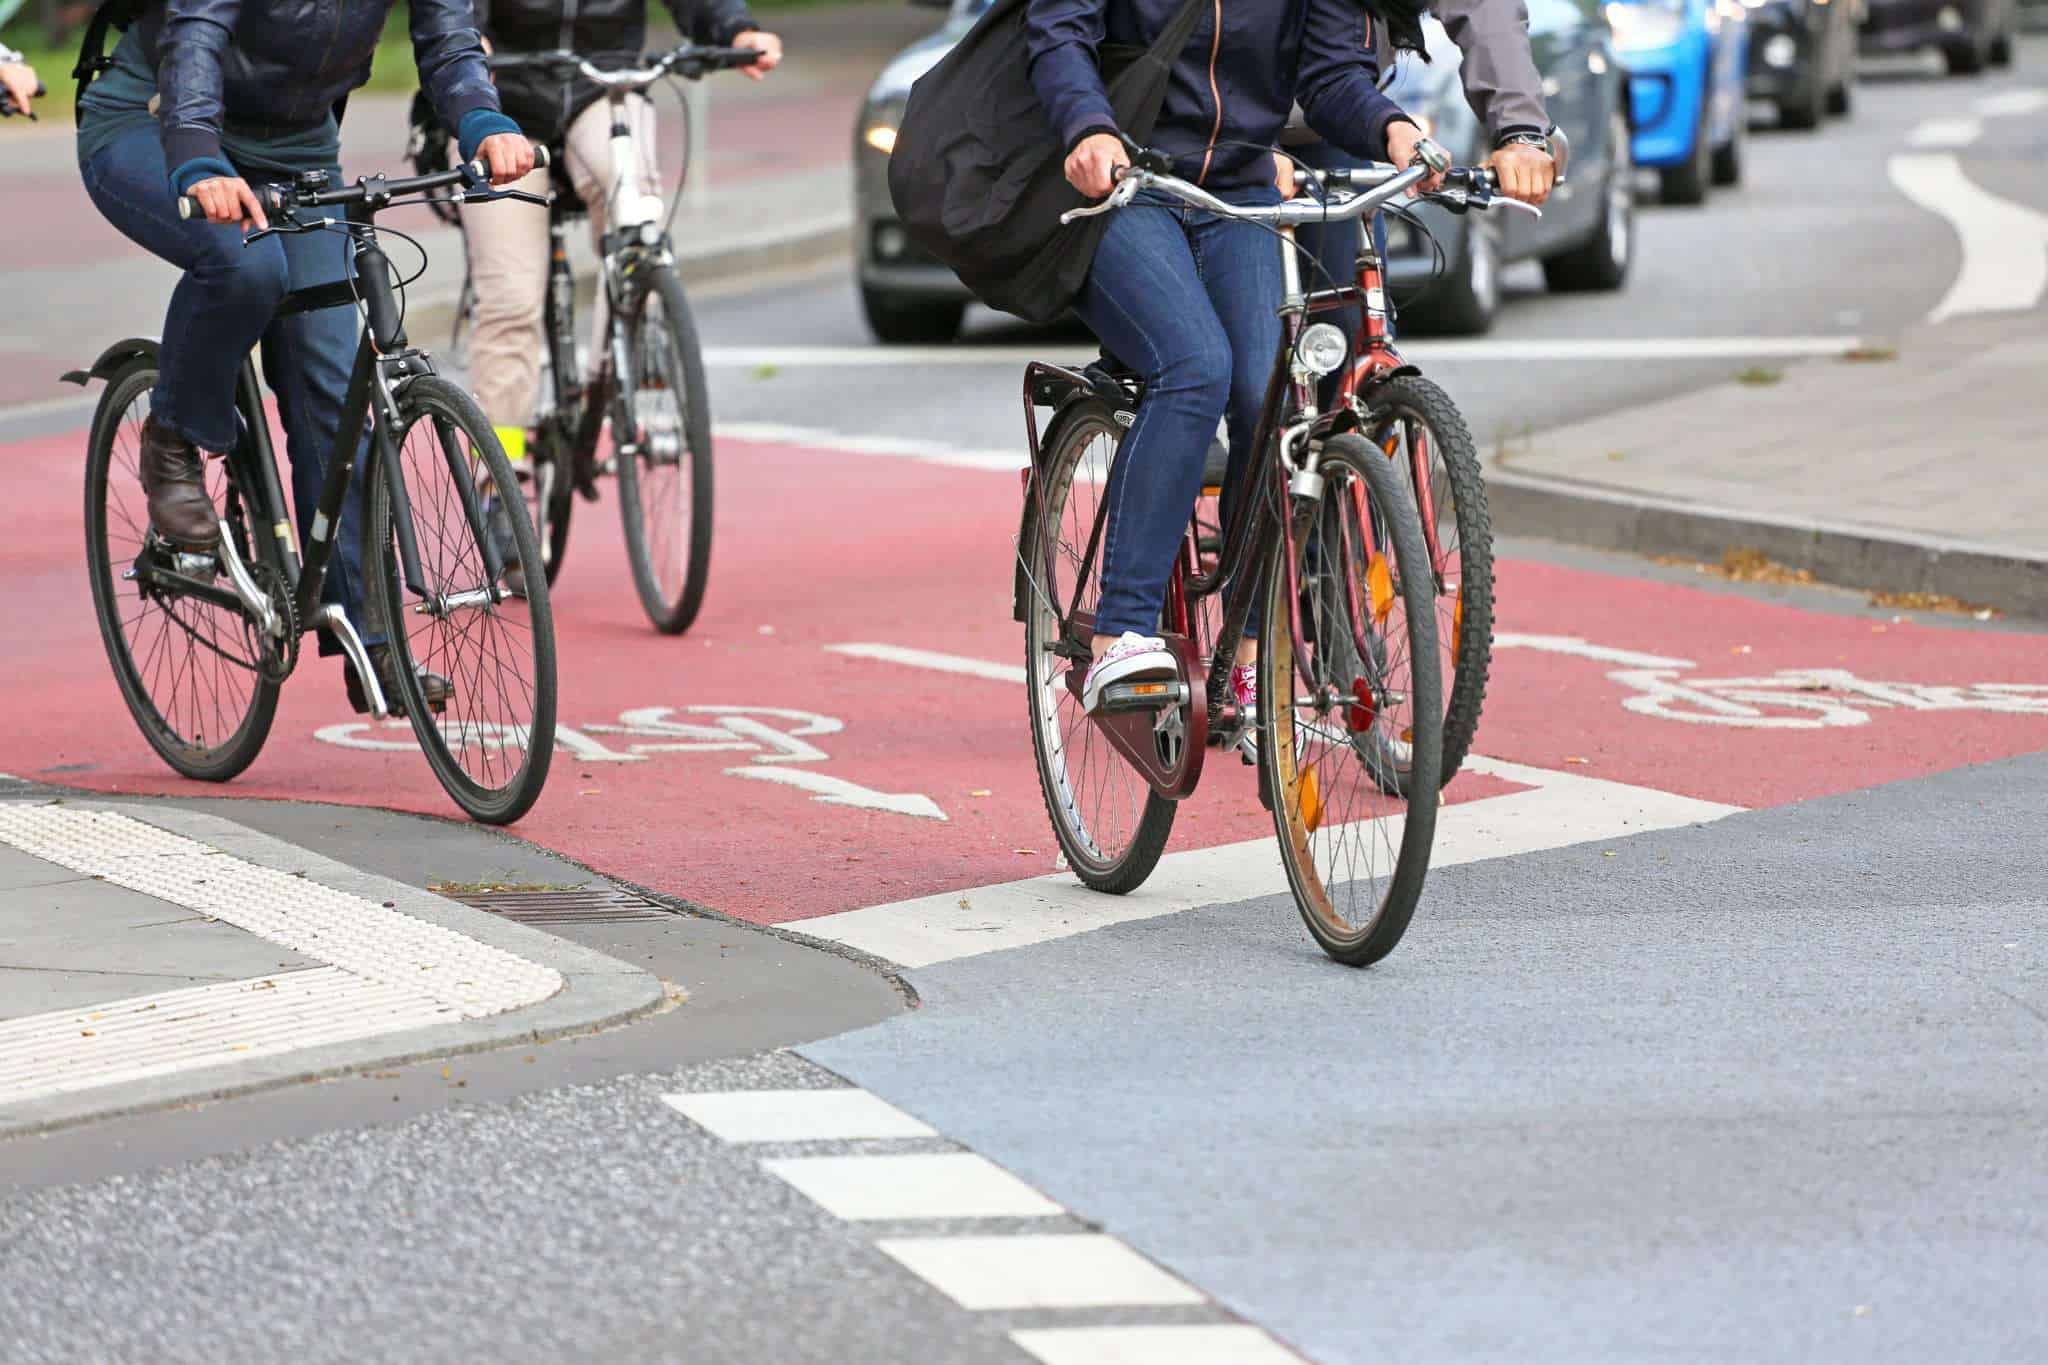 manutençao-bicicleta